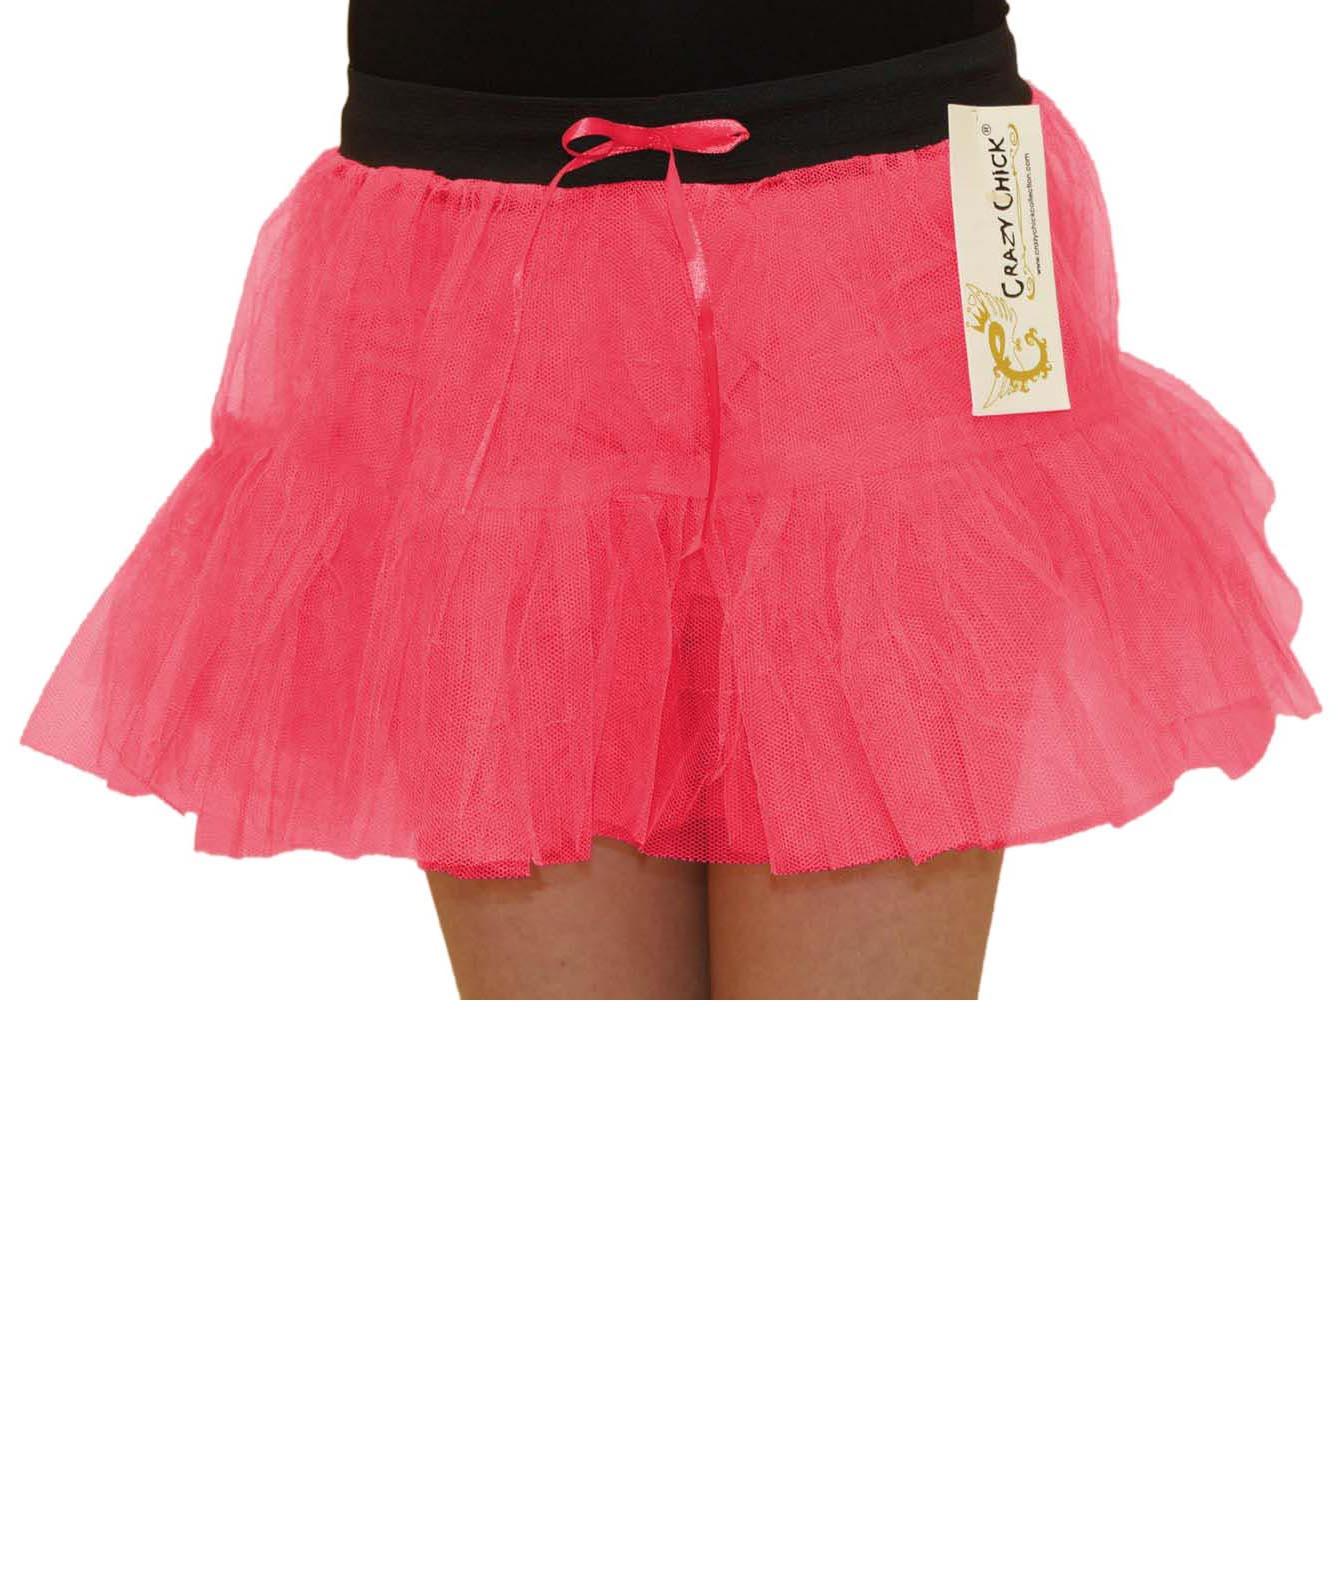 Crazy Chick Girls 2 Layers Pink TuTu Skirt